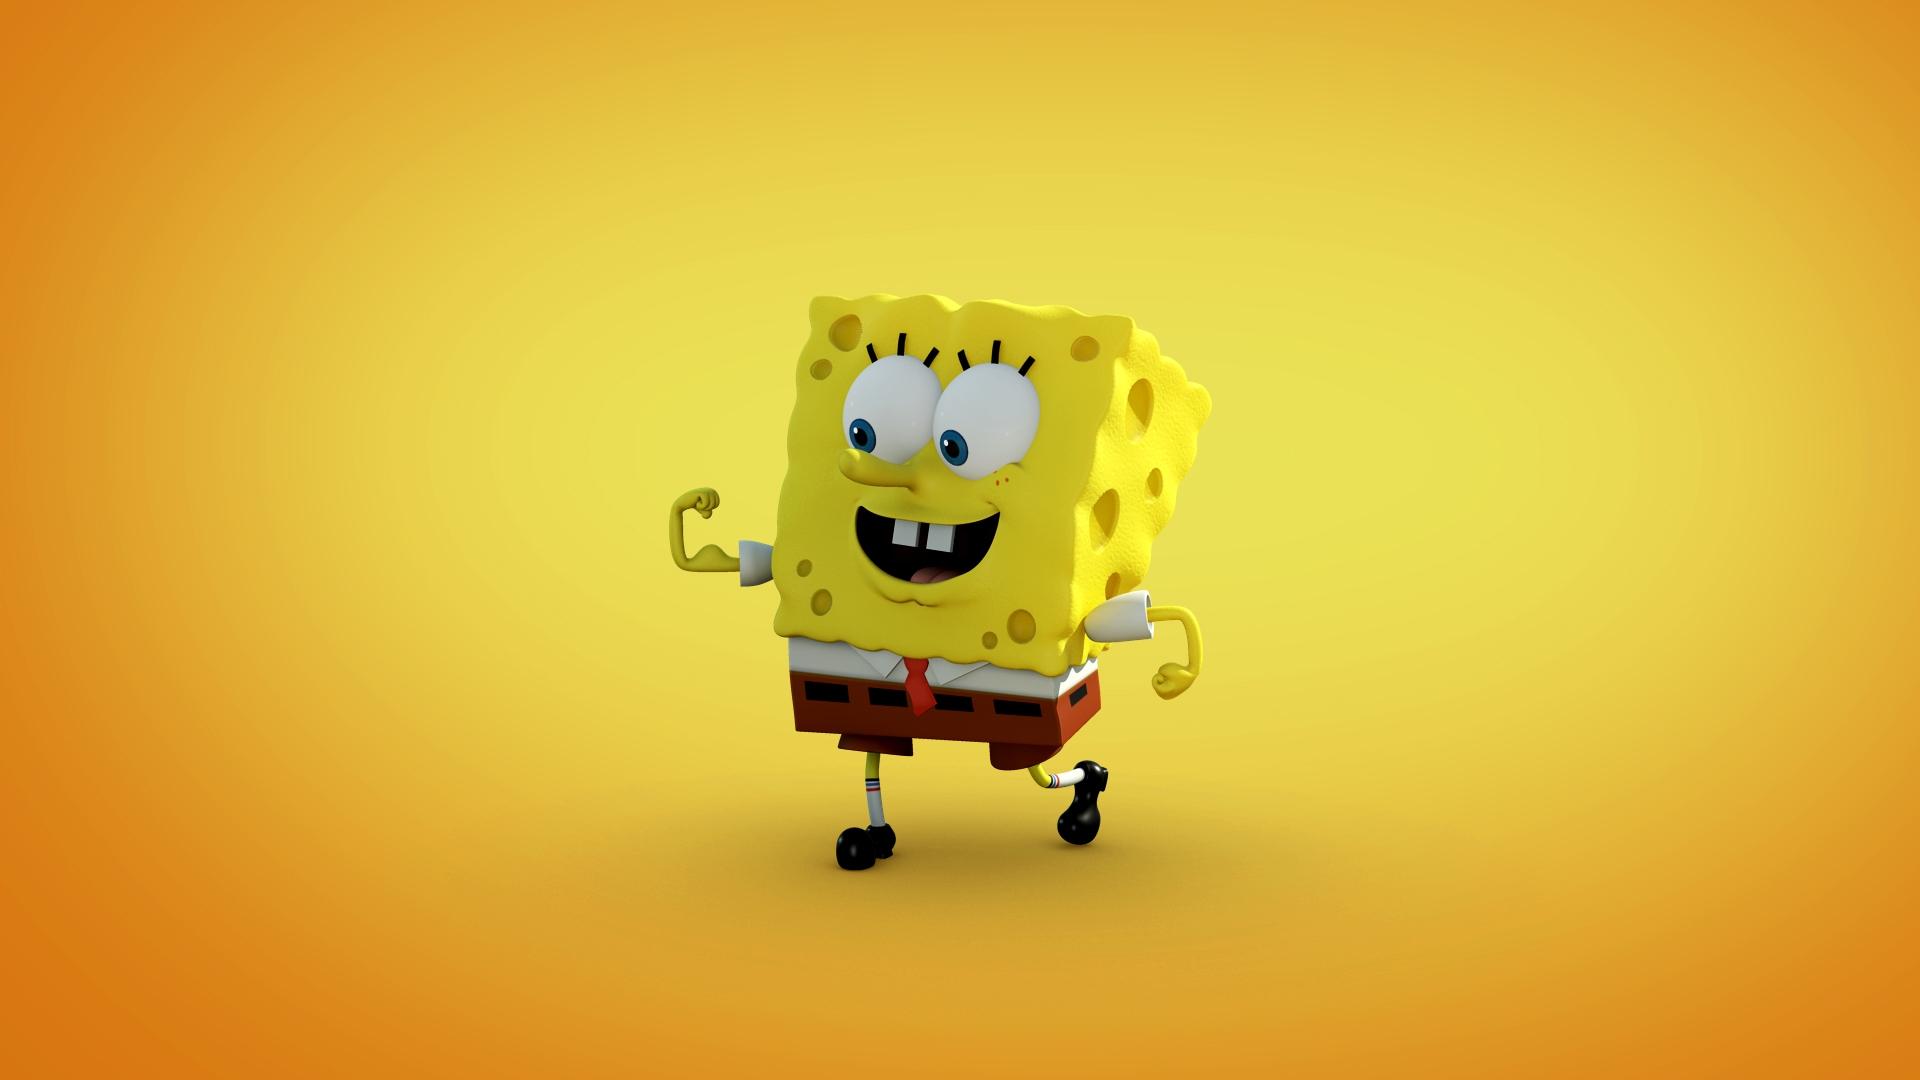 Spongebob Spongebob Squarepants Wallpaper 40643634 Fanpop